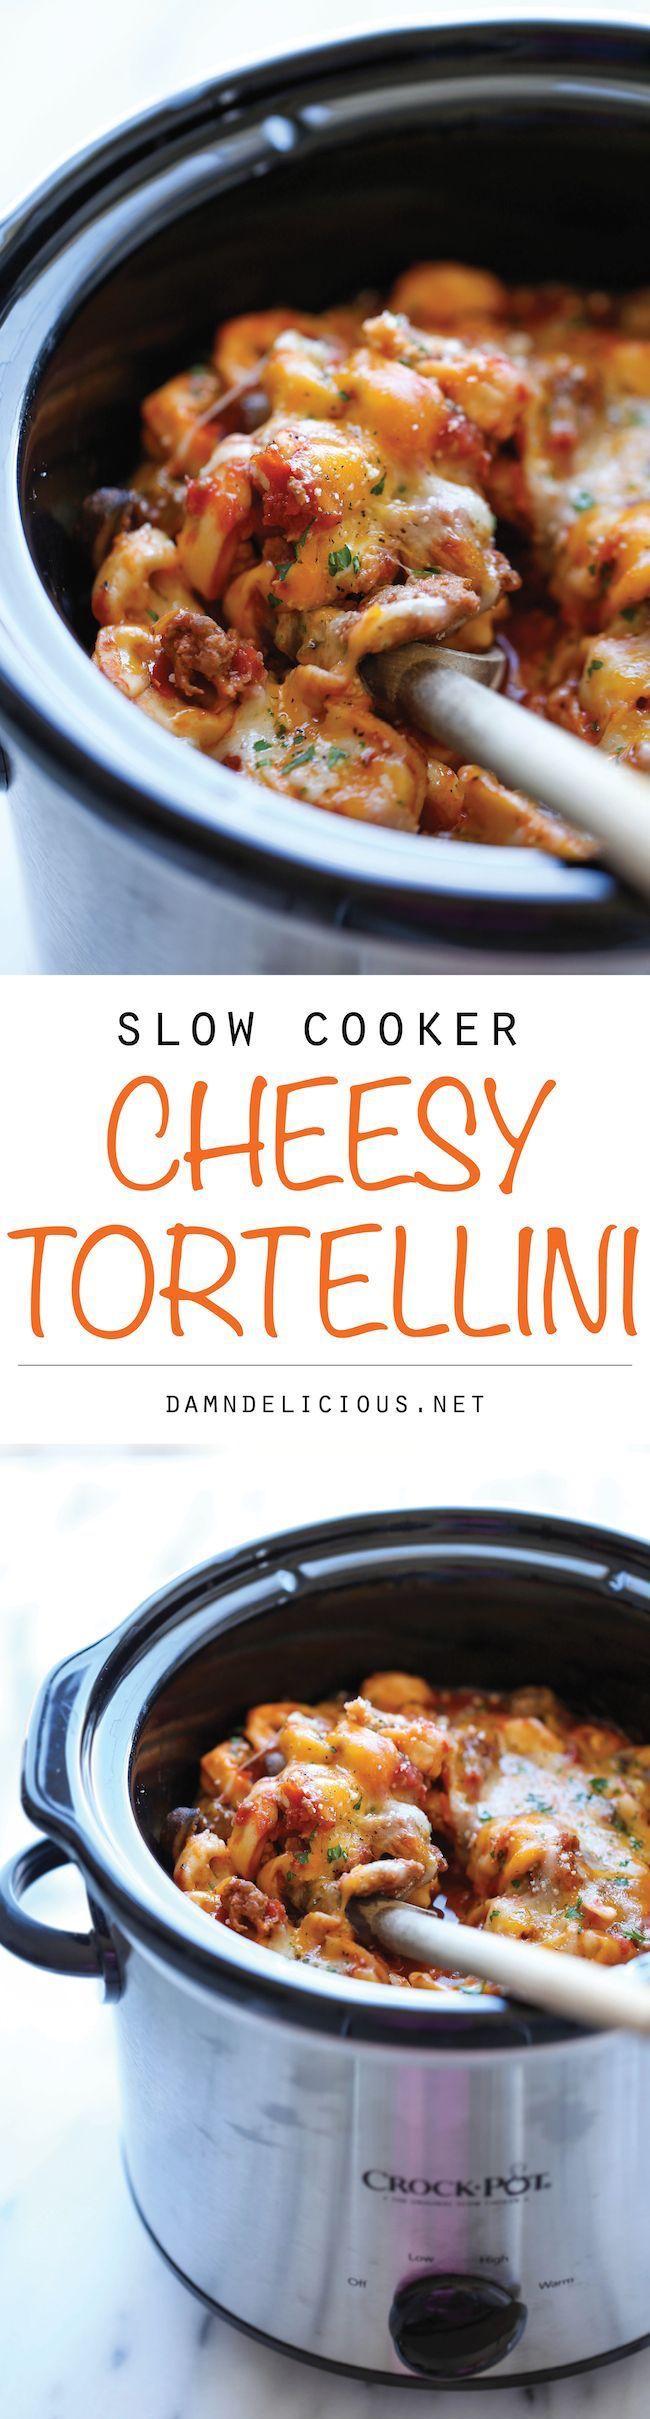 slow cooker cheesy tortellini & other amazing crockpot recipes!